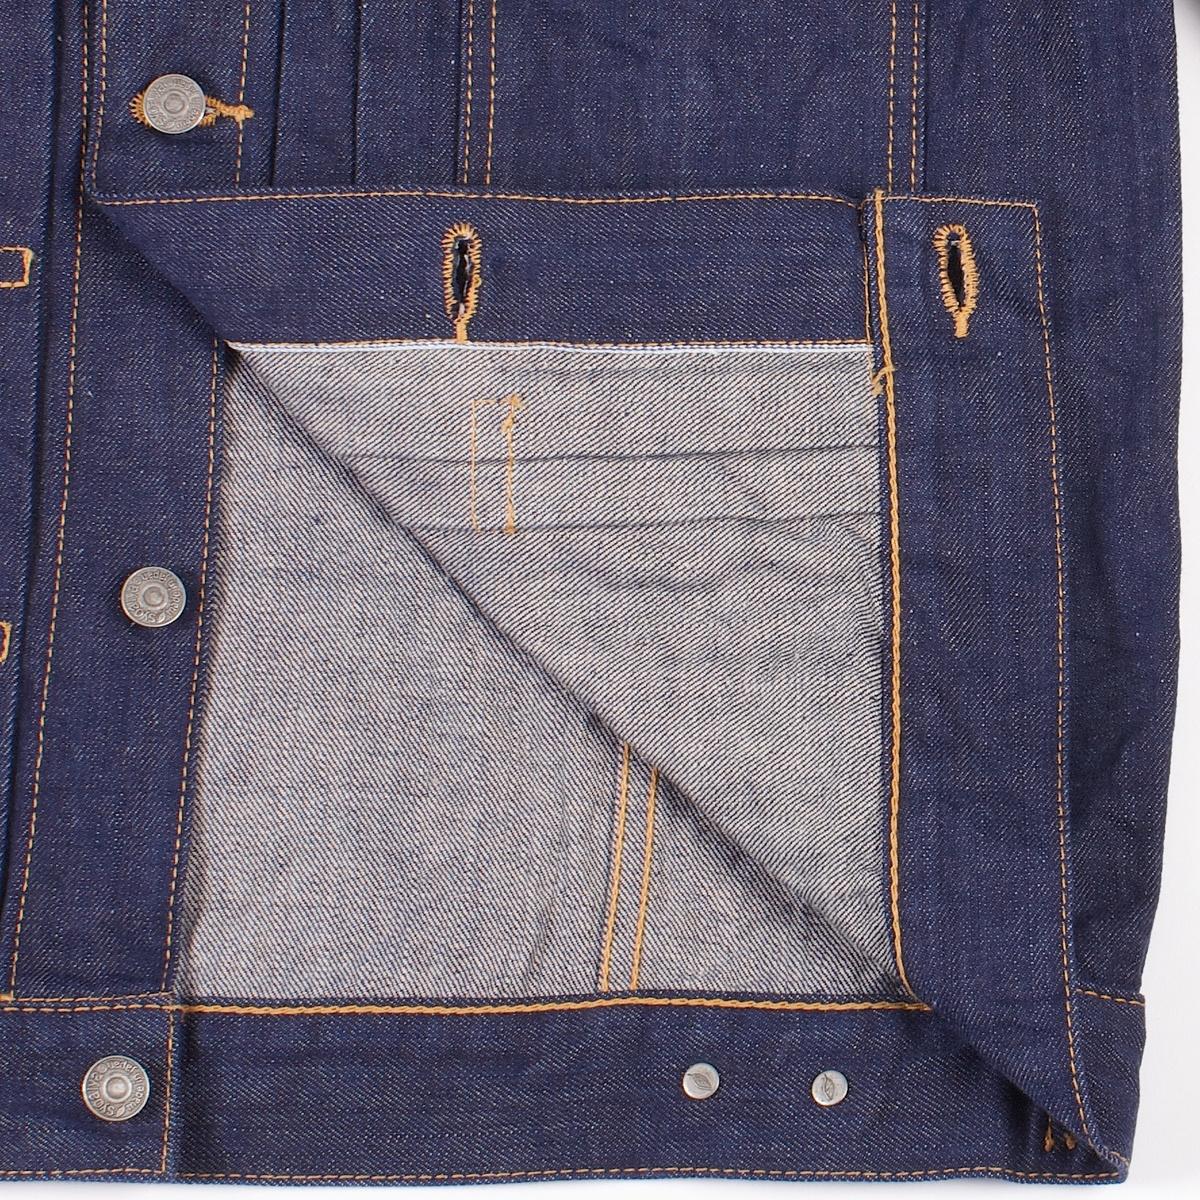 Pure Blue Japan Denim Jacket